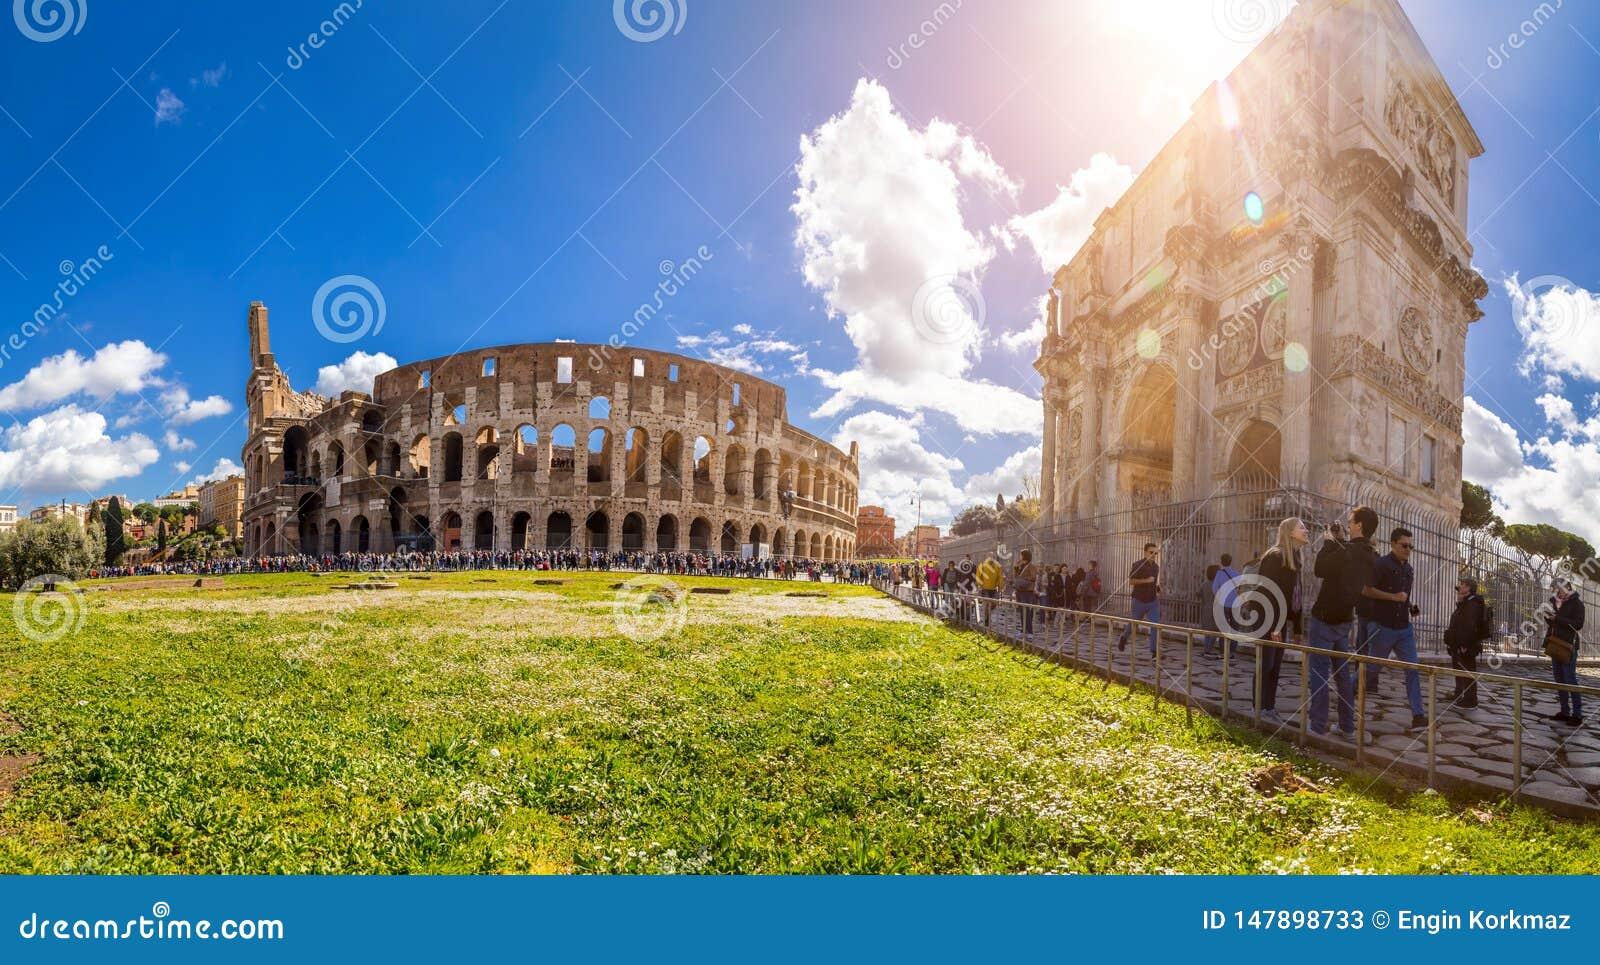 Exterior view of the ancient Roman Colloseum in Rome